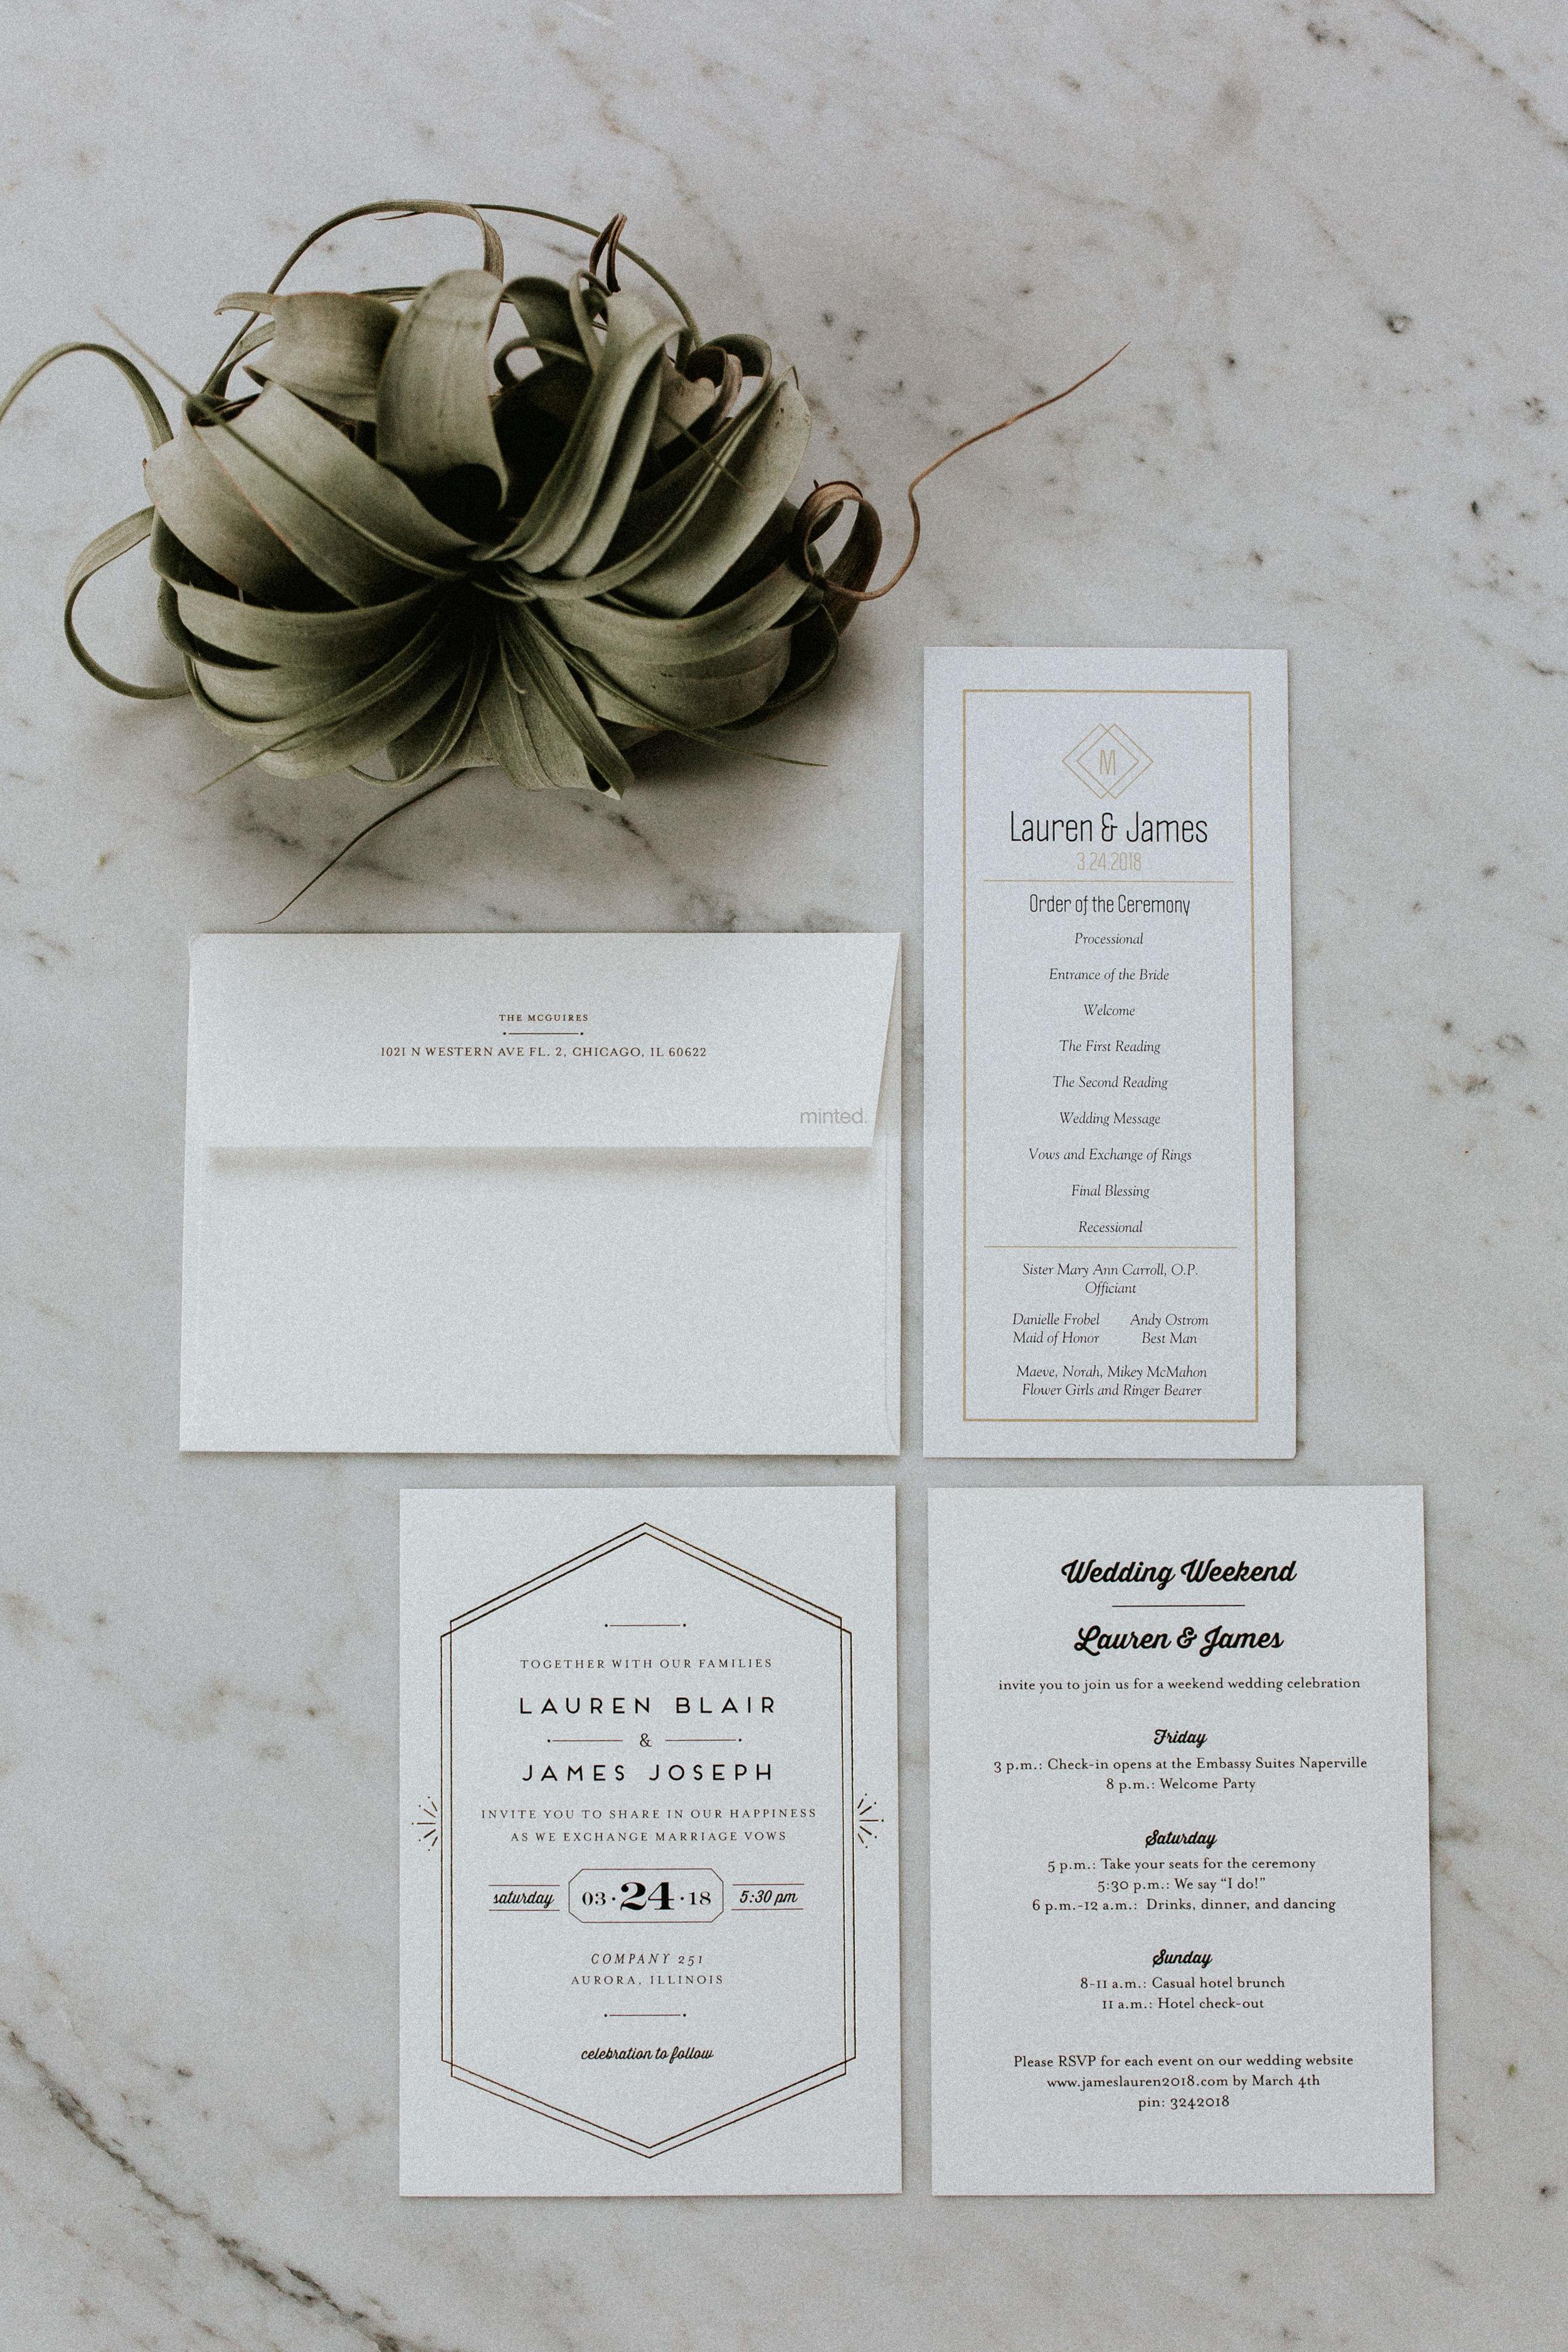 LJ-Wedding-0025.jpg